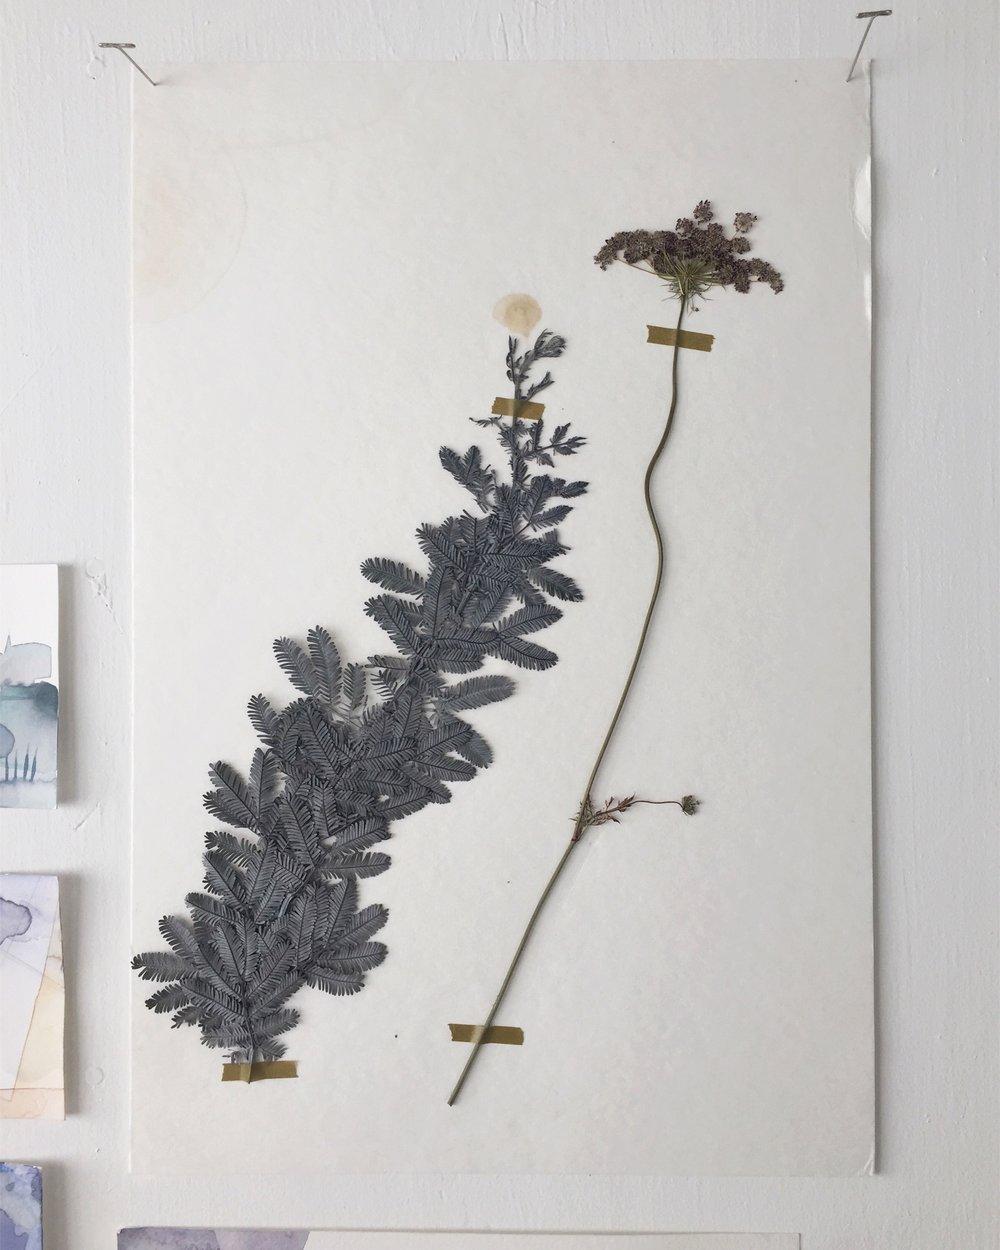 pressed   pressed botanicals, cotton paper  2017